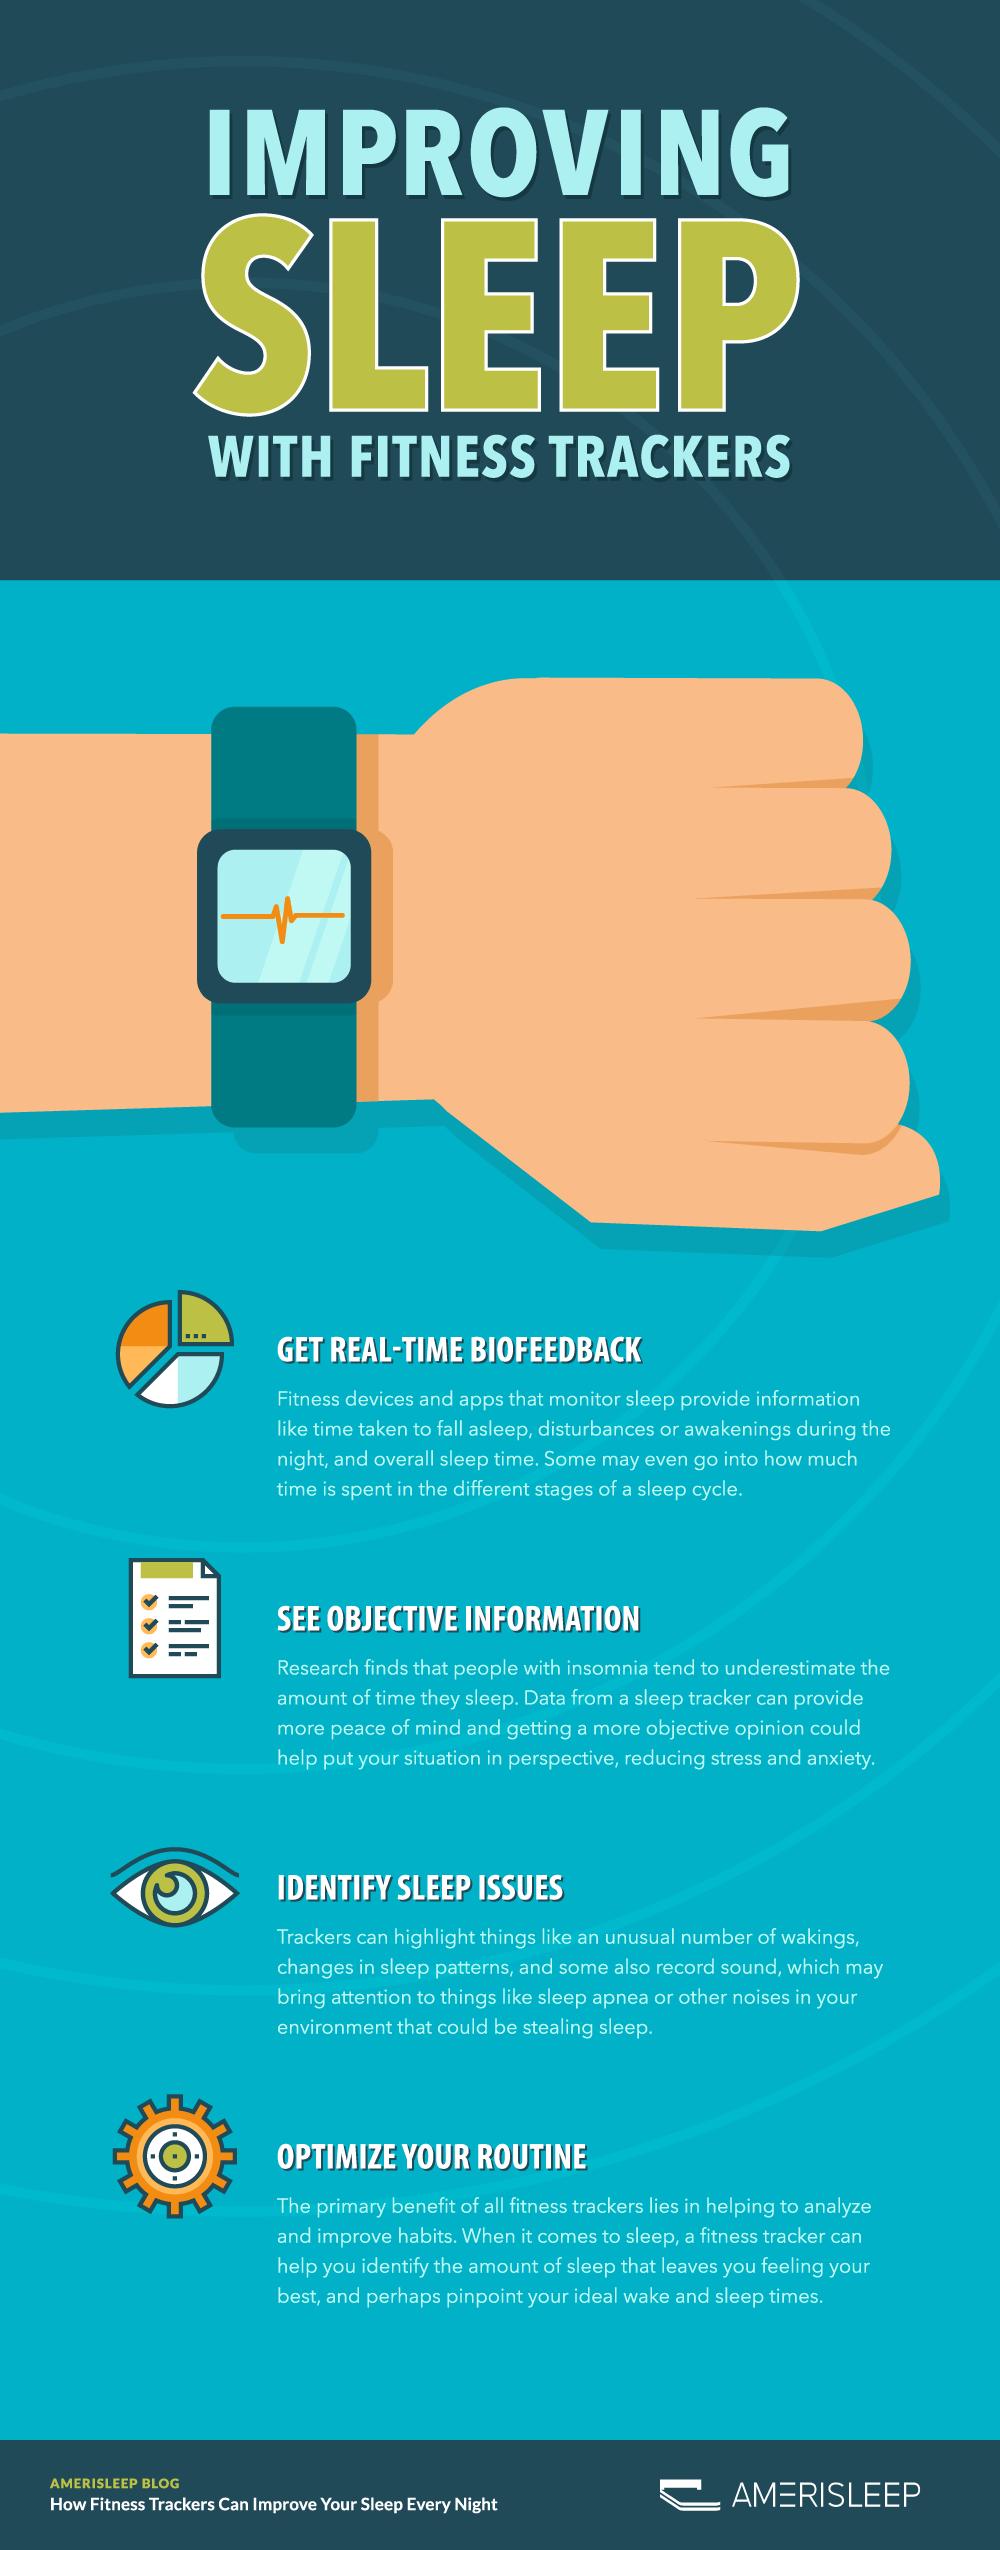 Amerisleep: Improving Sleep with Fitness Trackers Infographic